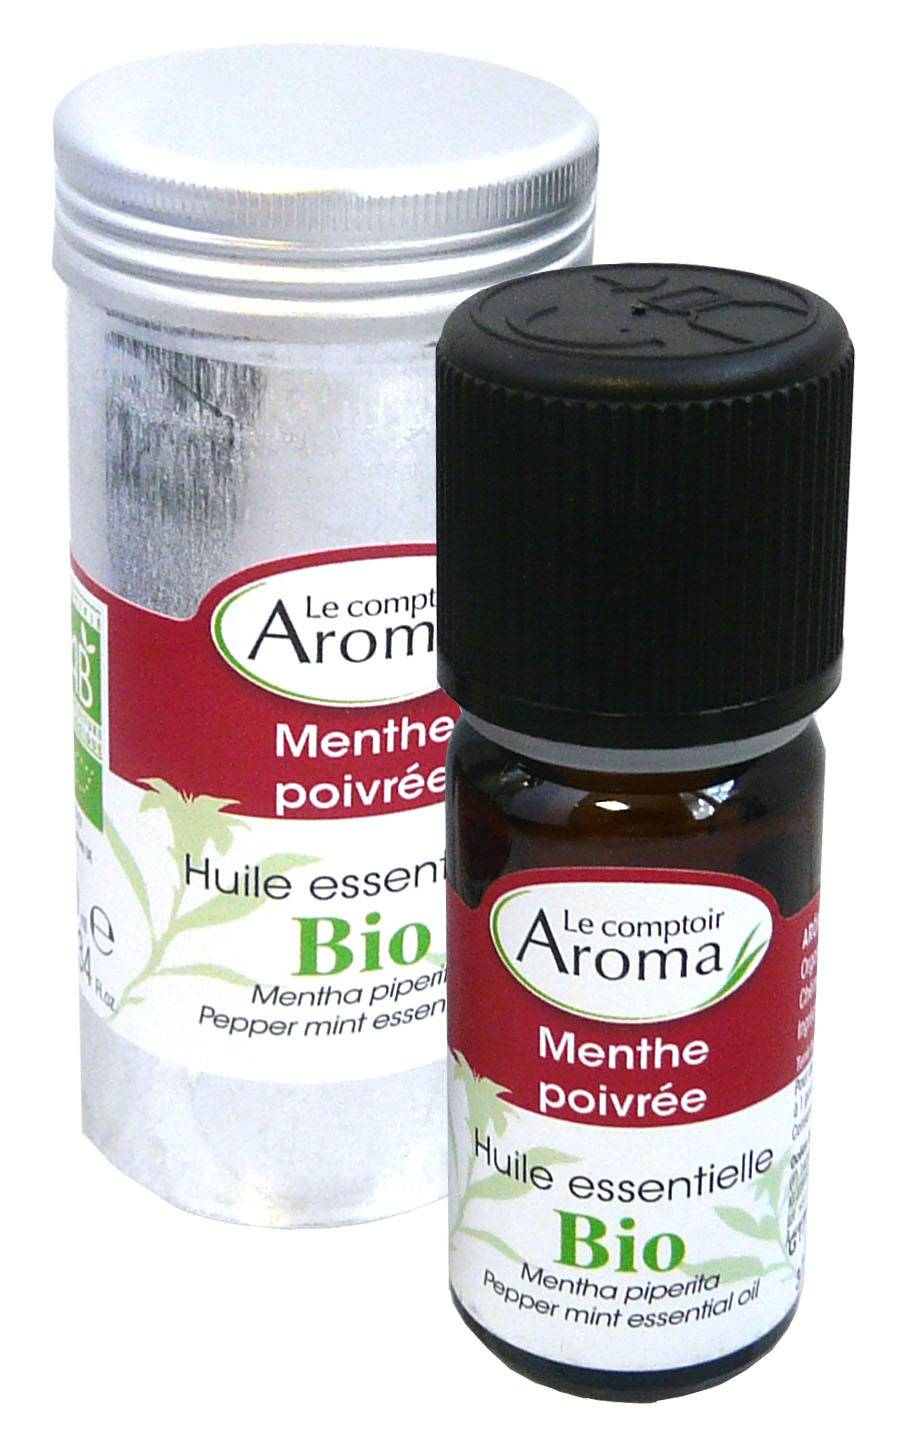 Le comptoir aroma huile essentielle bio menthe poivree 10ml